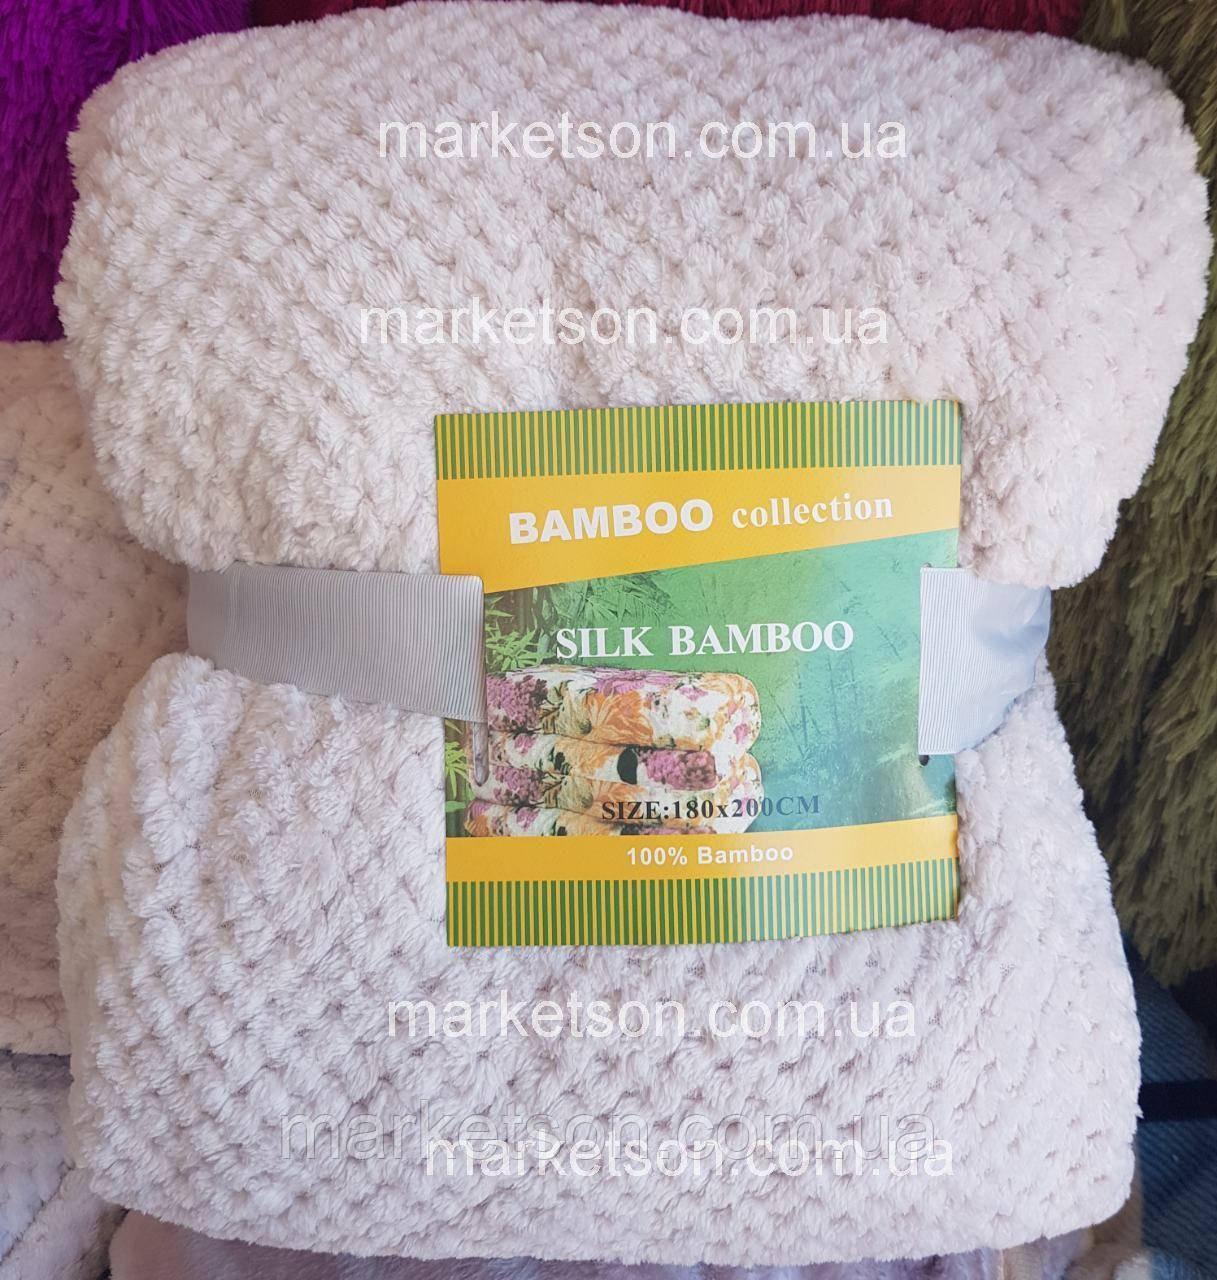 Бамбуковый плед покрывало Bamboo Евро размер 200*230